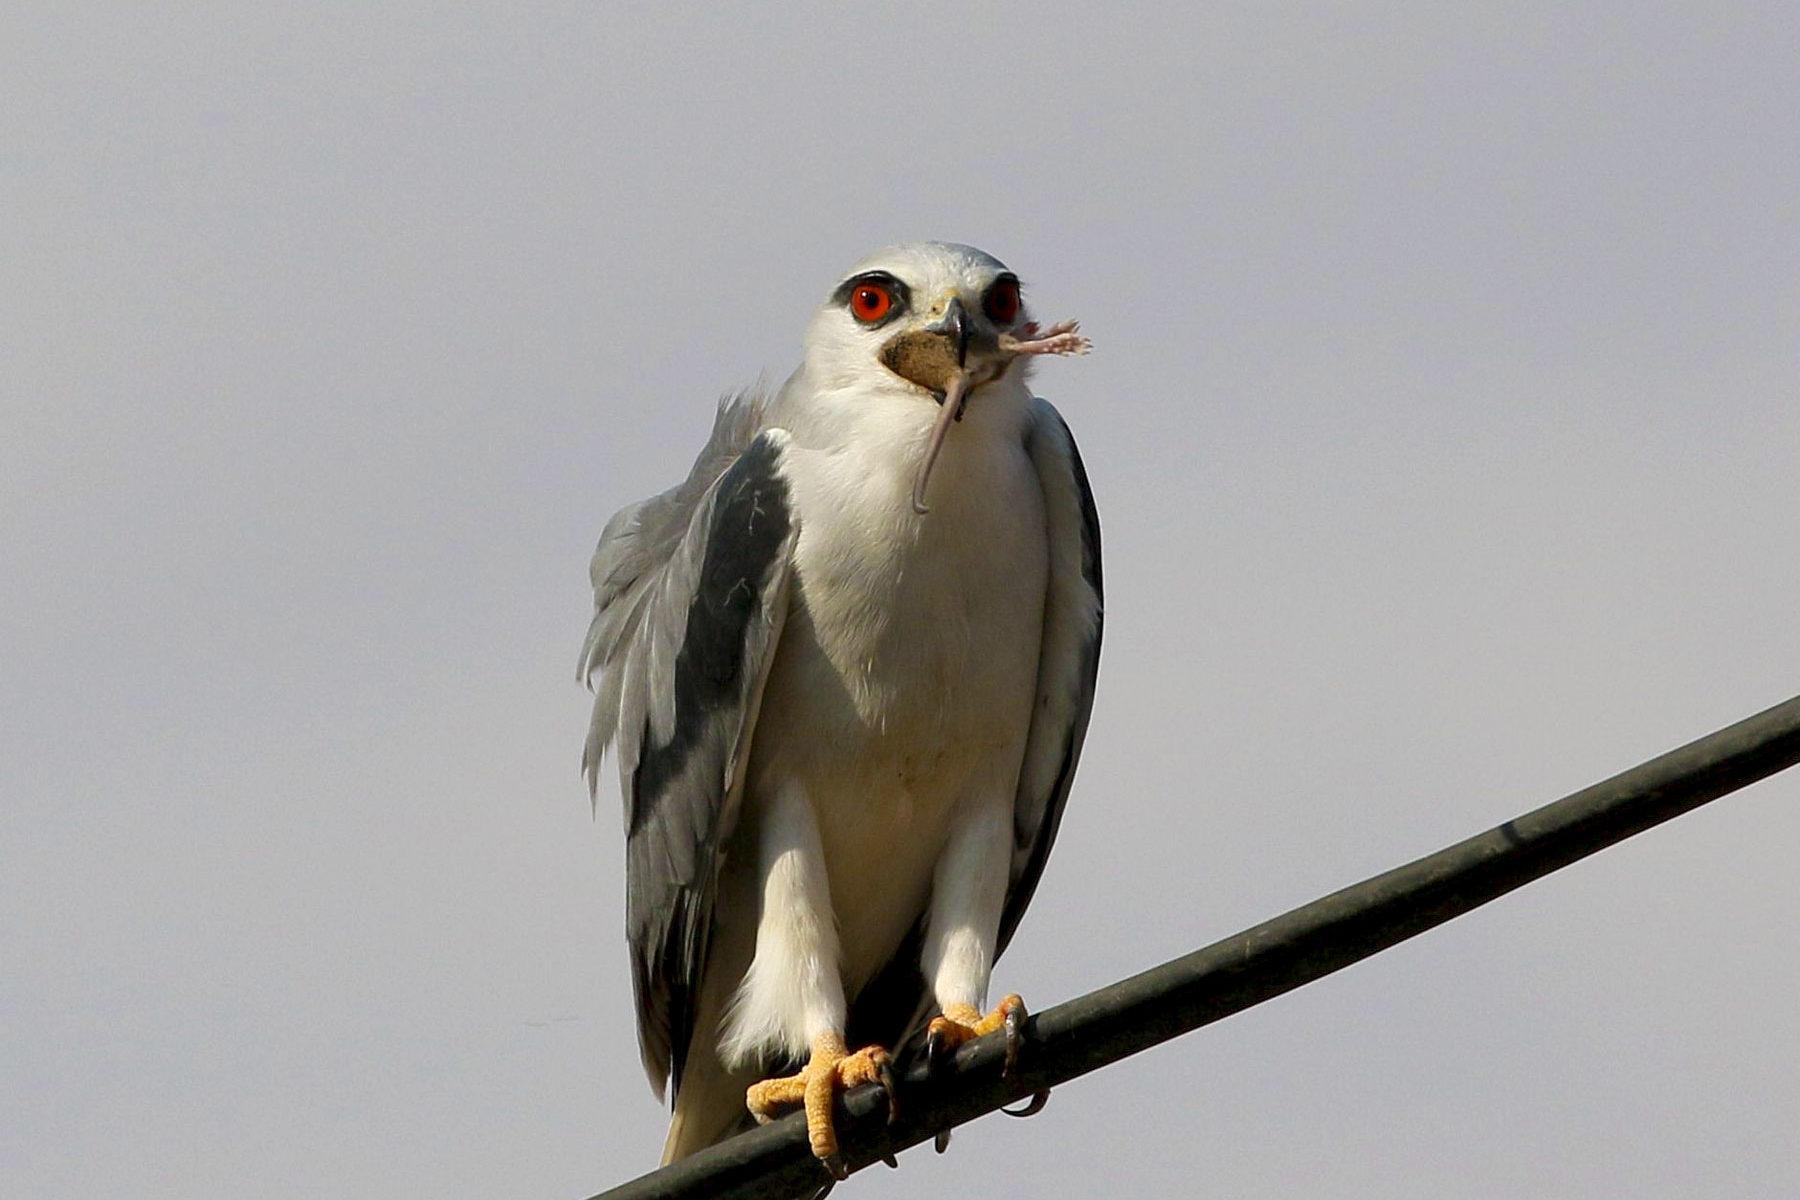 Black-winged-Kite-Ghor-Rama-Jordan-Valley-7-December-2019-photo-by-Fares-Khoury